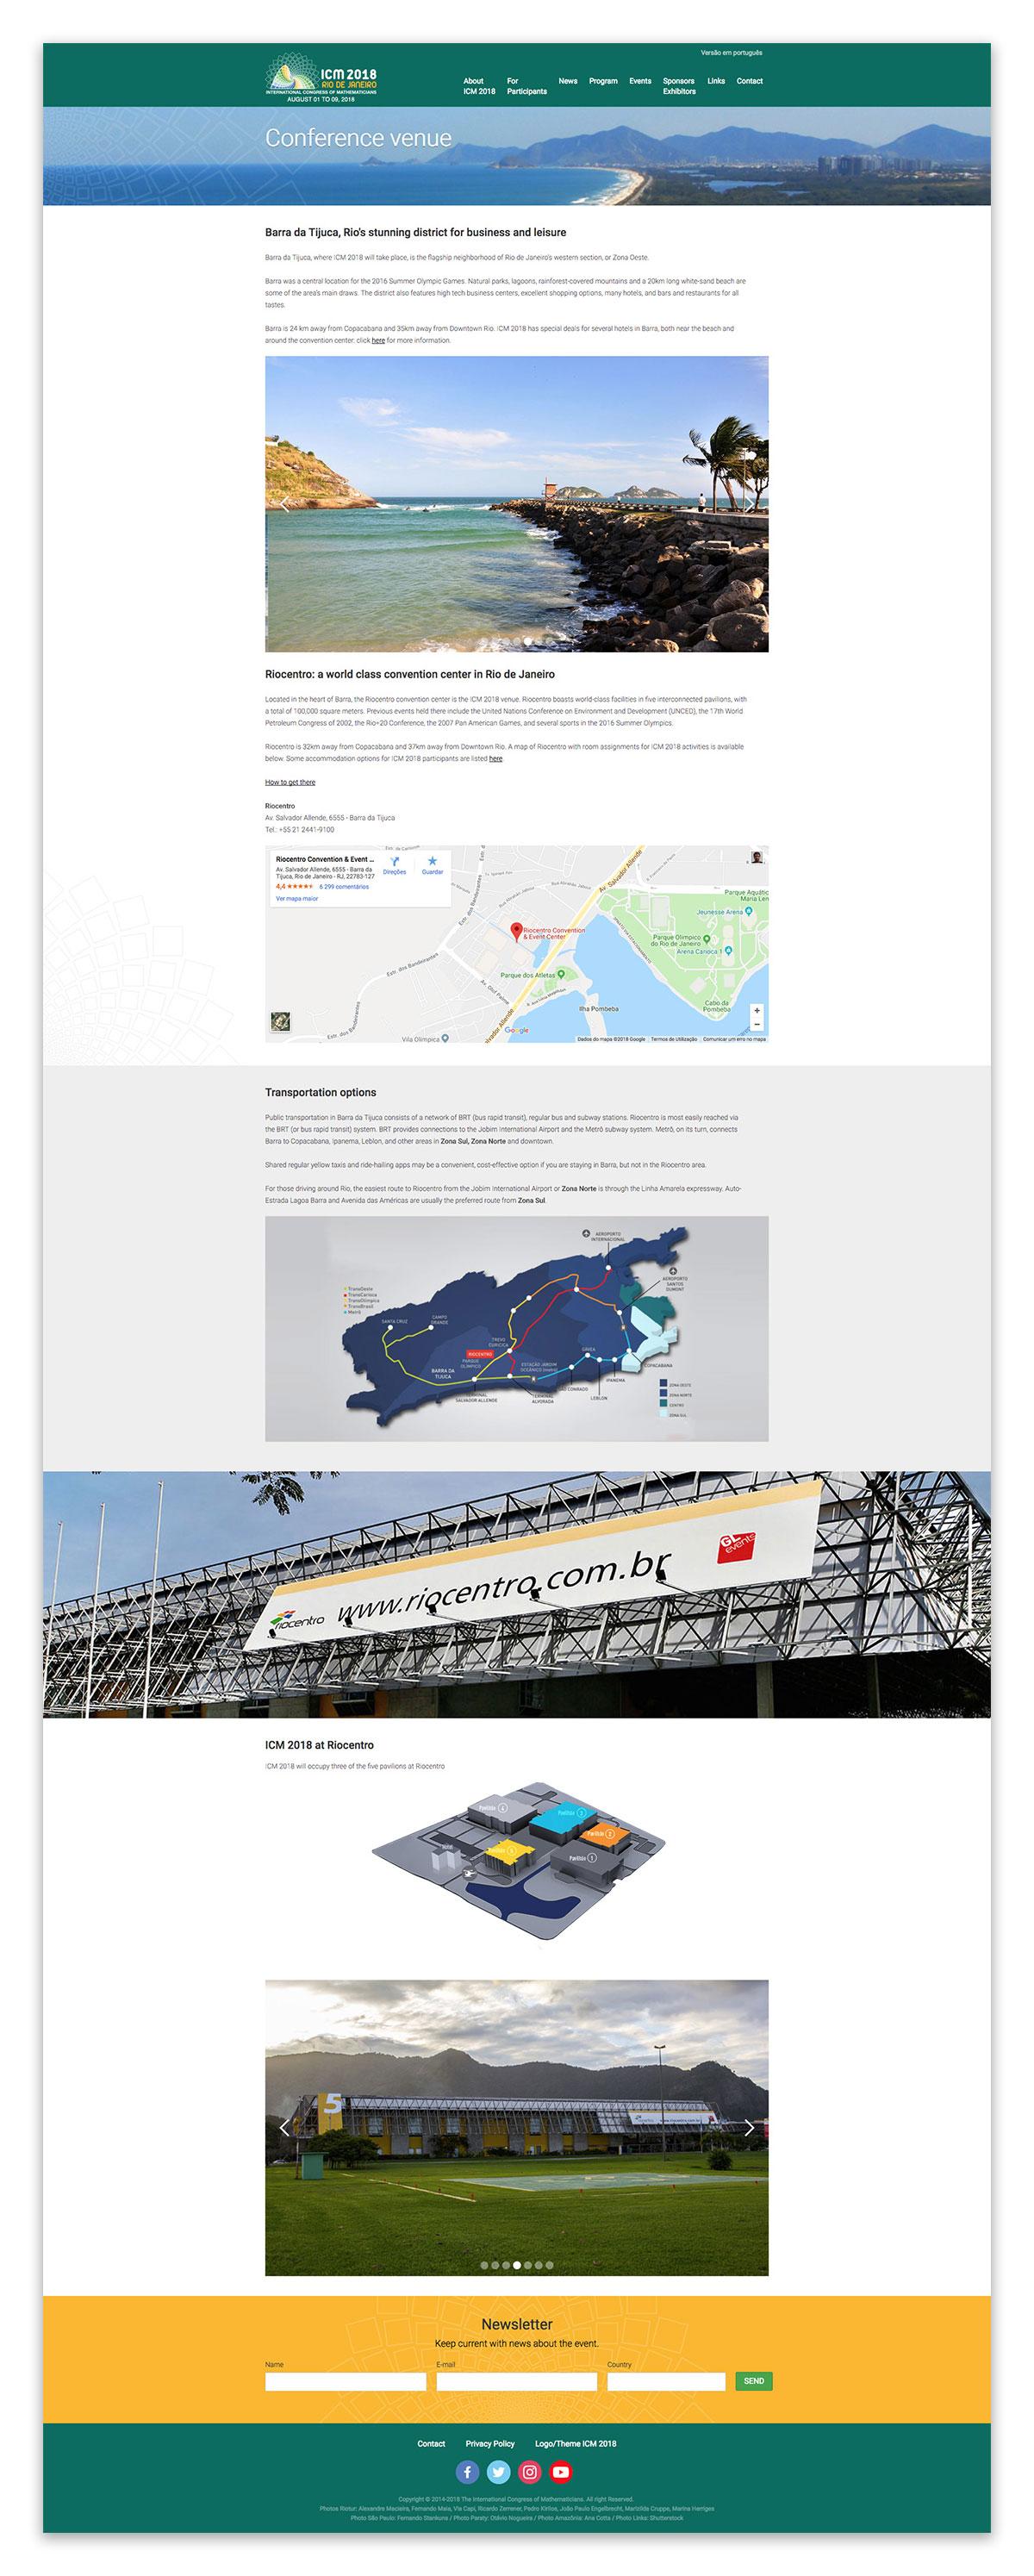 screencapture-icm2018-org-portal-en-conference-venue-1518592136287.jpg